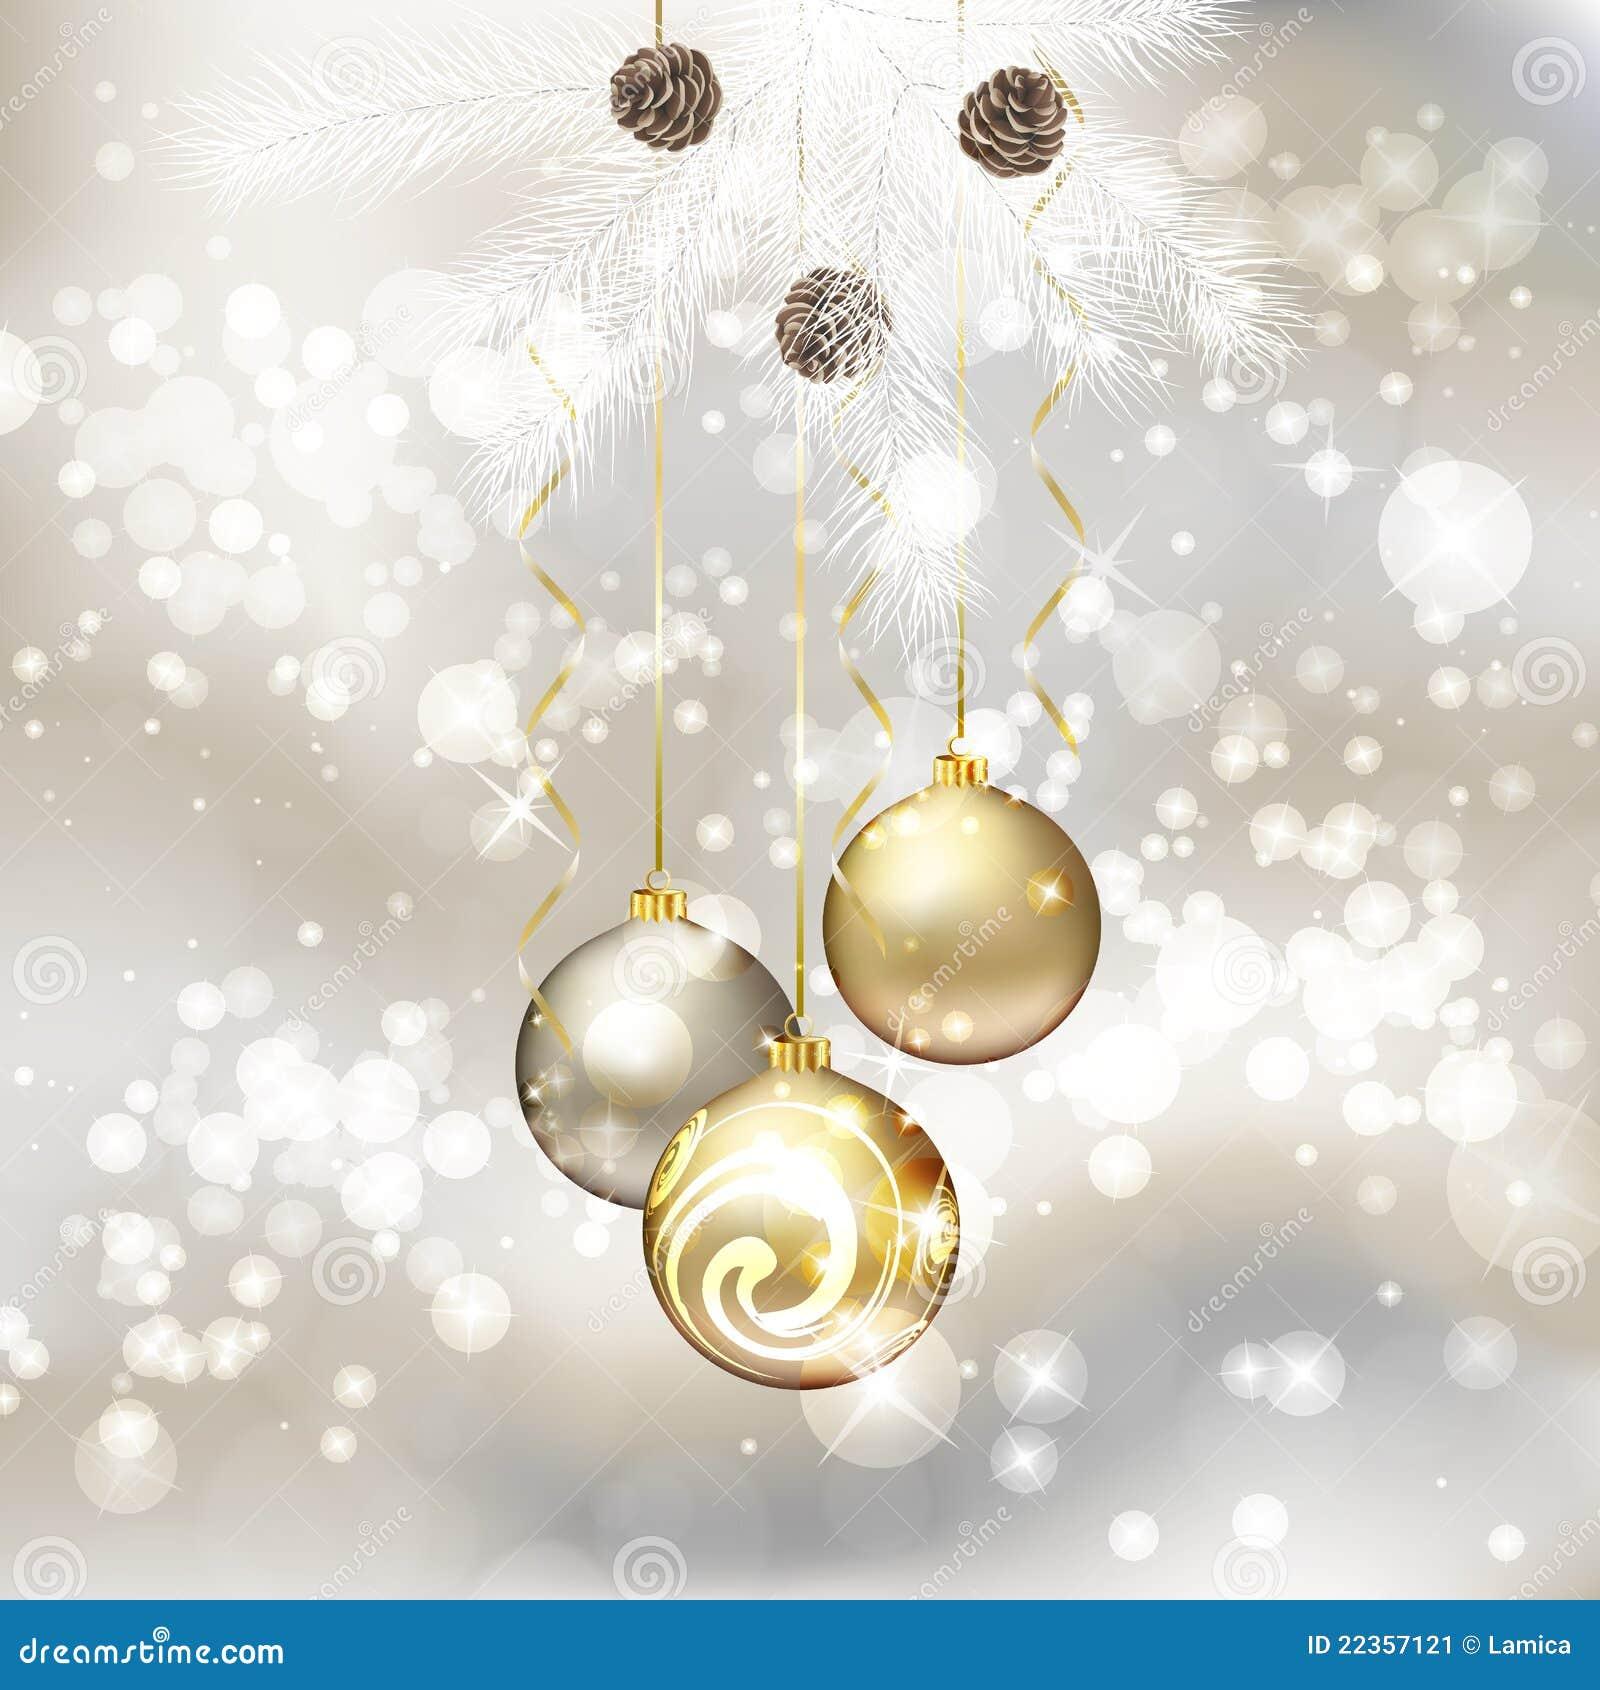 Auguri Di Buon Natale Eleganti.Cartolina D Auguri Di Buon Natale Con Le Sfere Di Natale